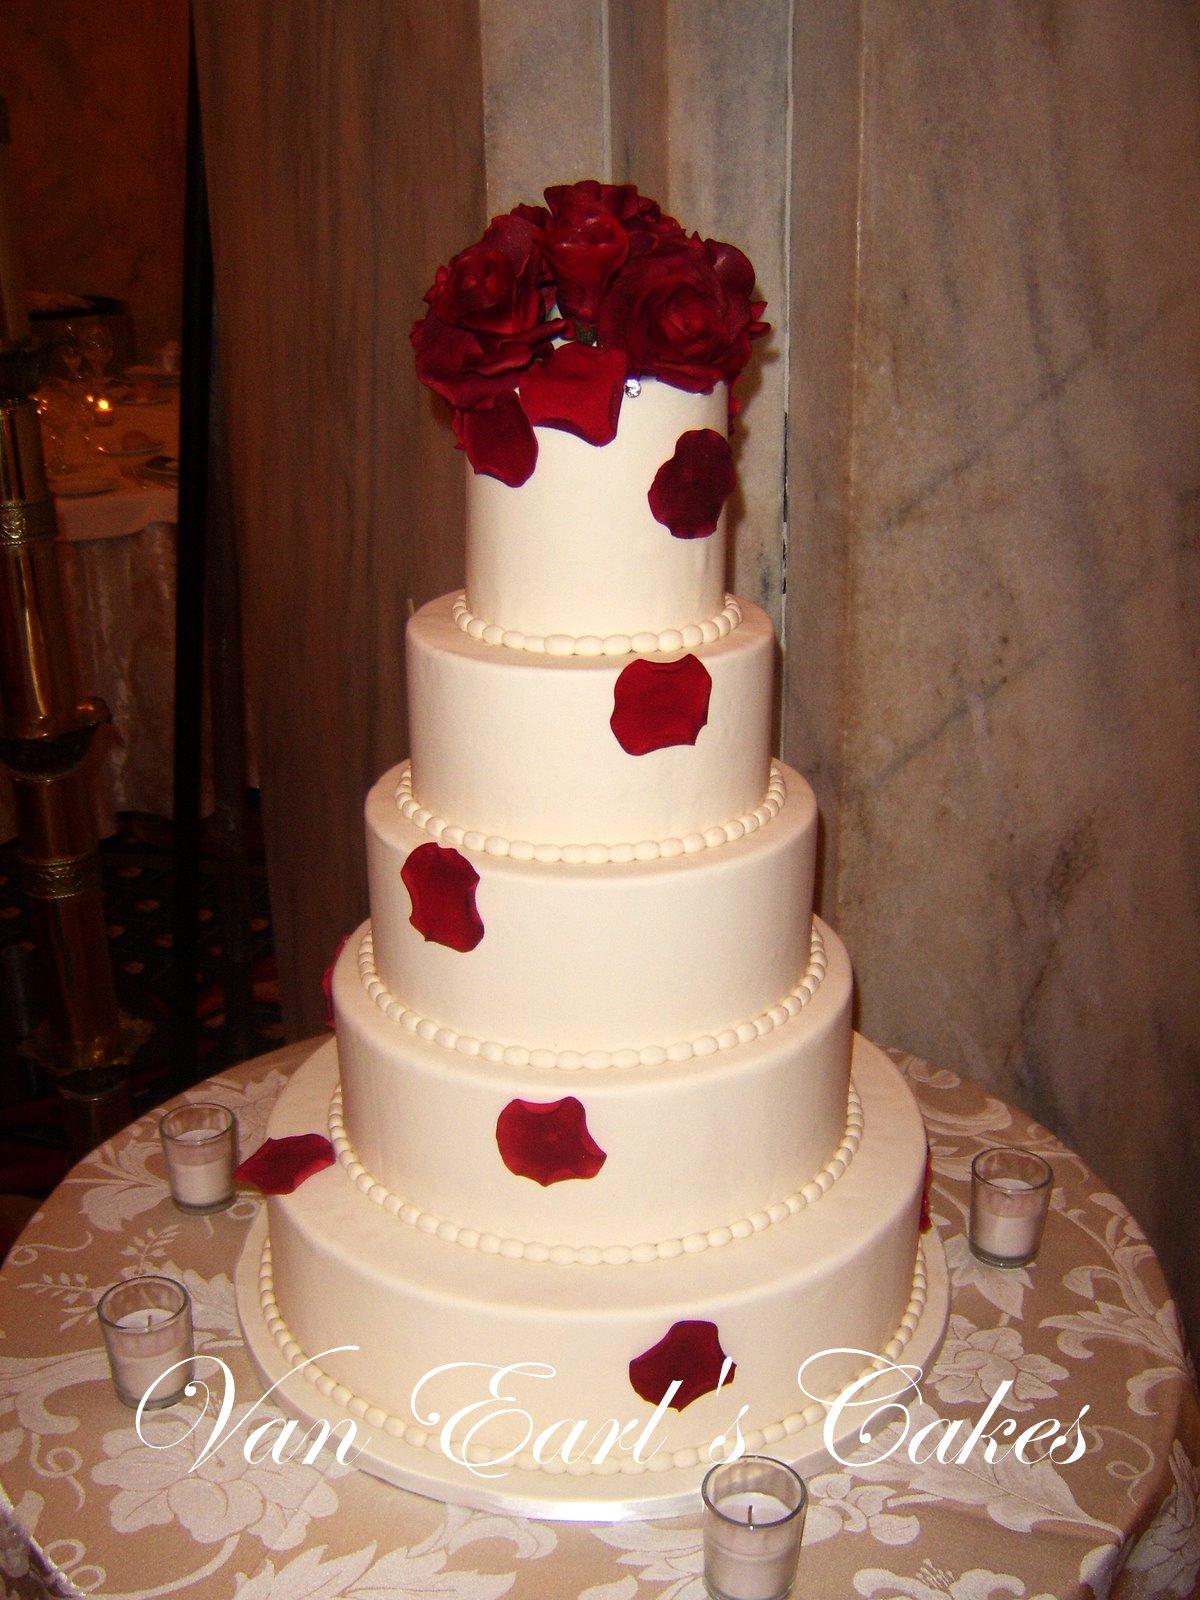 van earl 39 s cakes red rose wedding cake. Black Bedroom Furniture Sets. Home Design Ideas